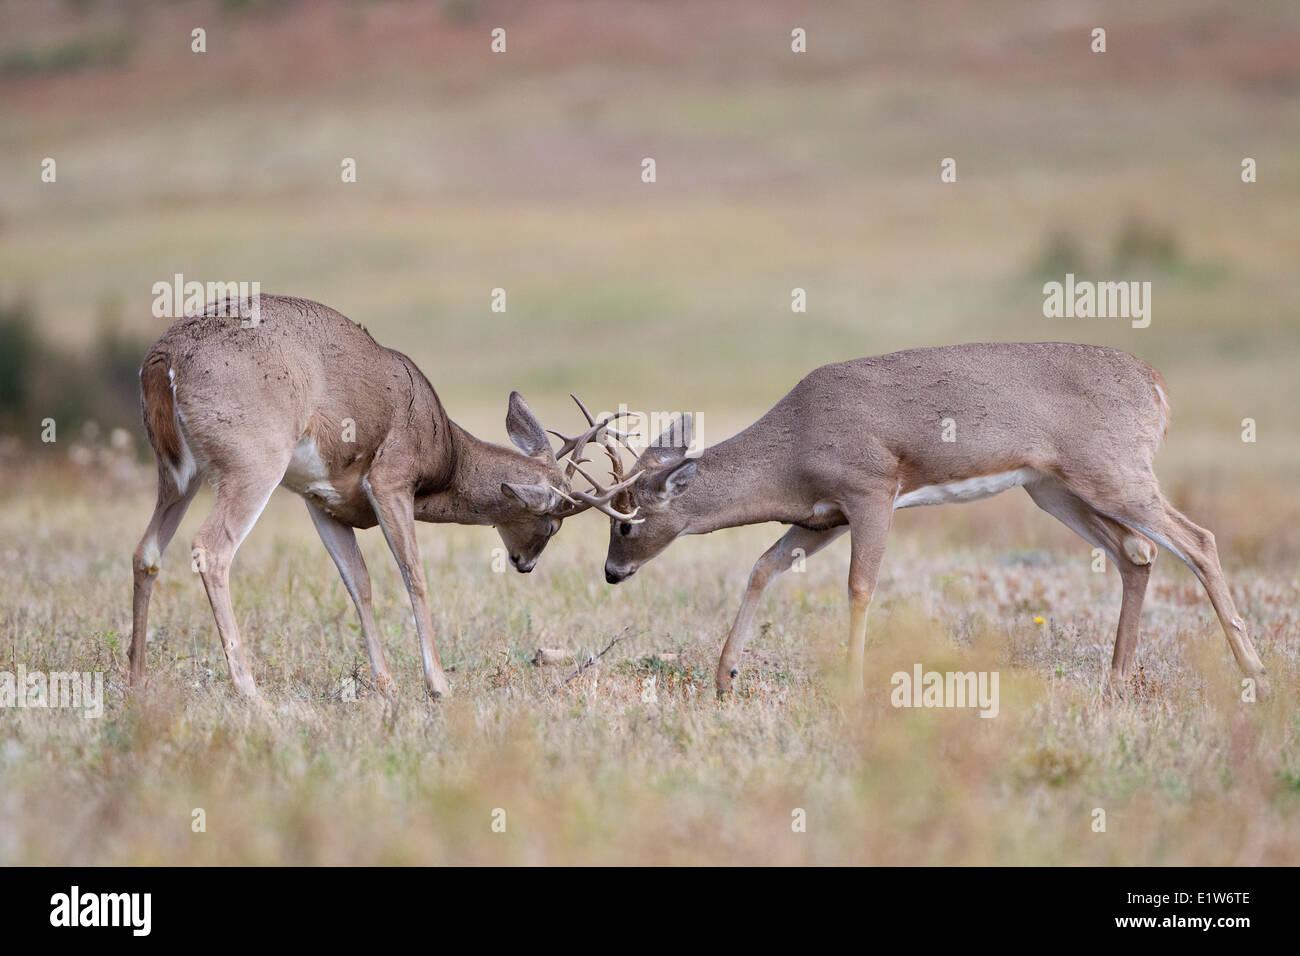 White-tailed deer (Odocoileus virginianus), bucks sparring, Custer State Park, South Dakota. - Stock Image